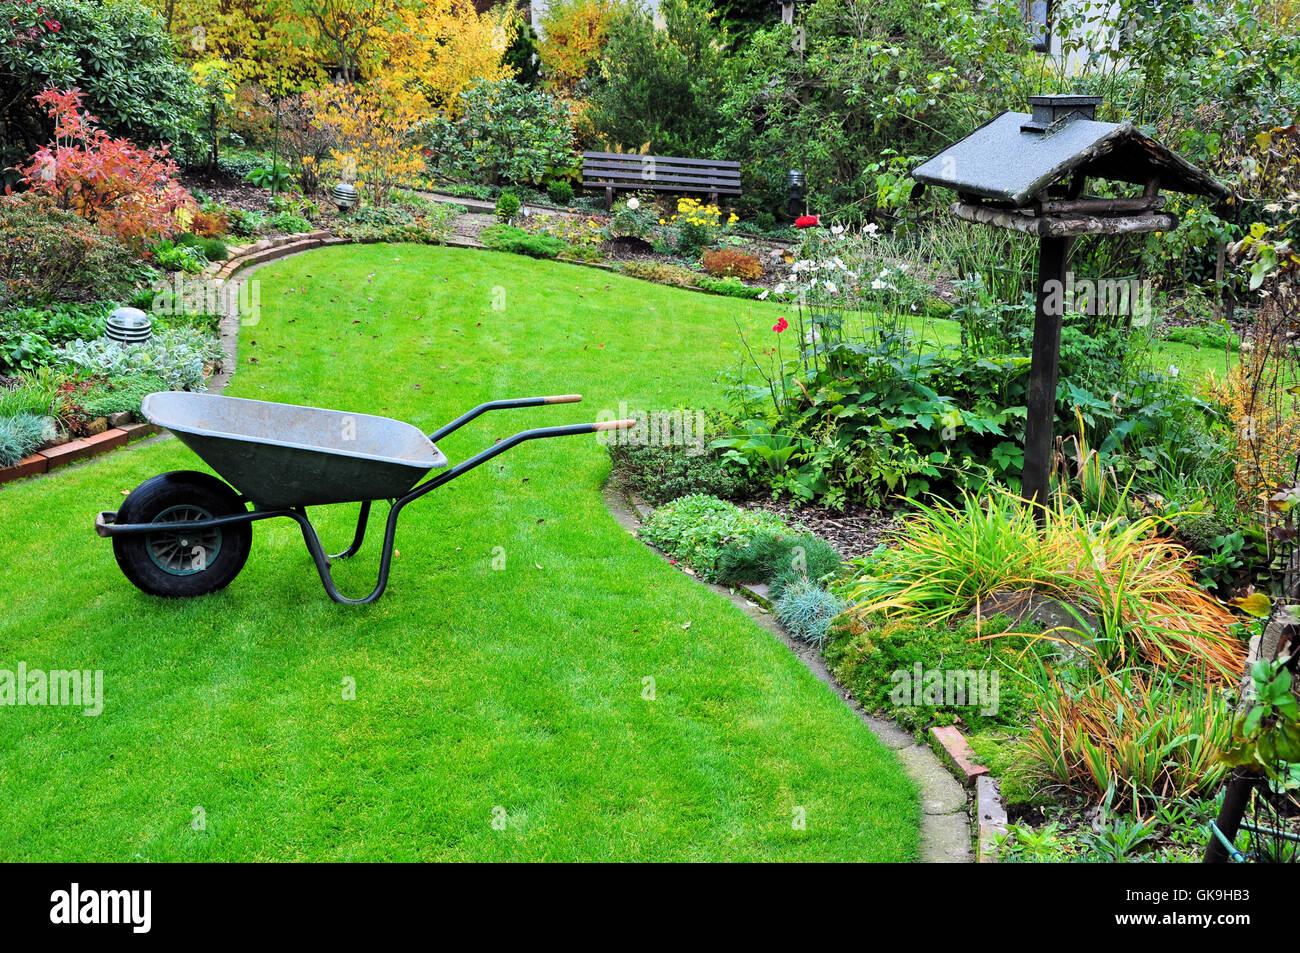 gardening with wheelbarrow in autumn garden - Stock Image